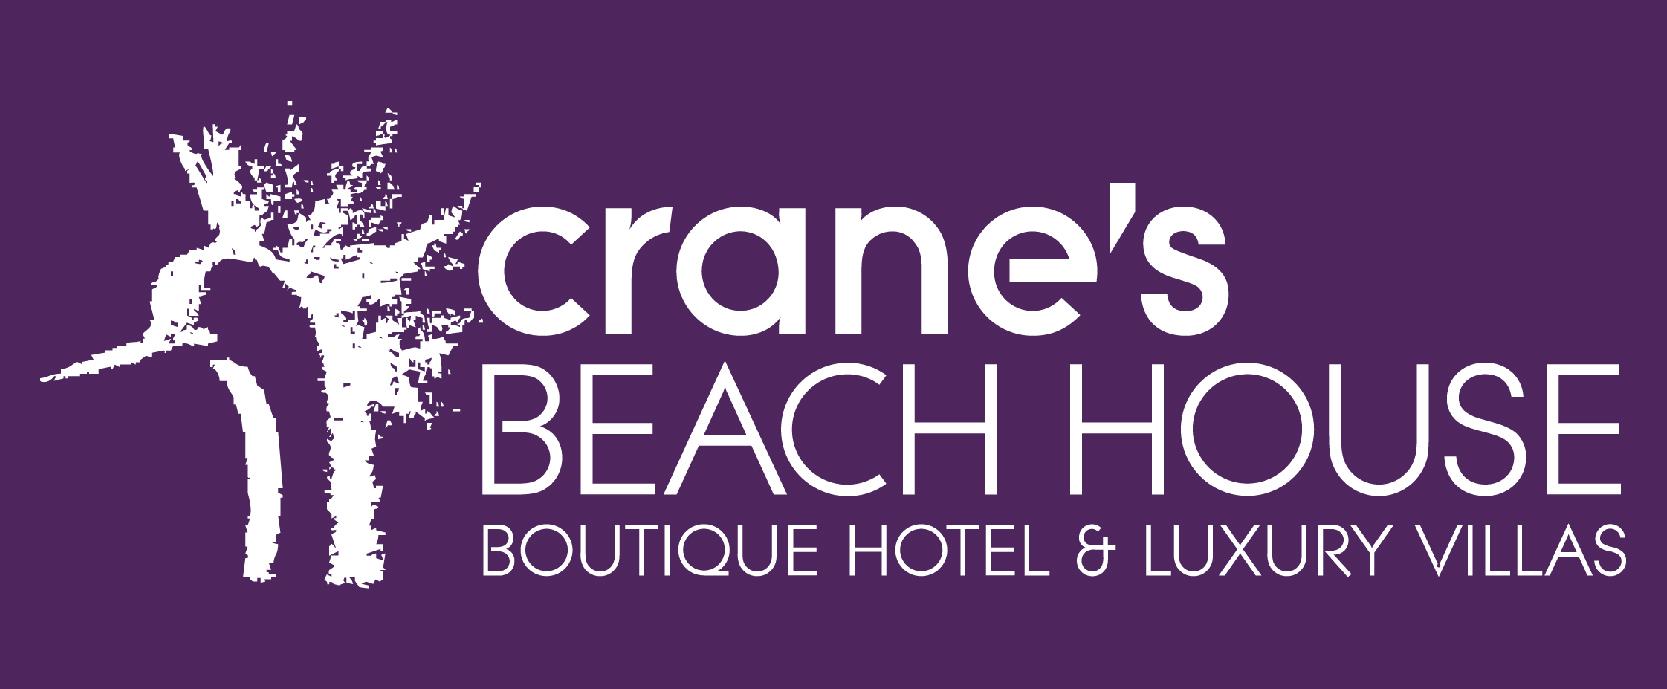 Crane's Beach House Boutique Hotel and Luxury Villas